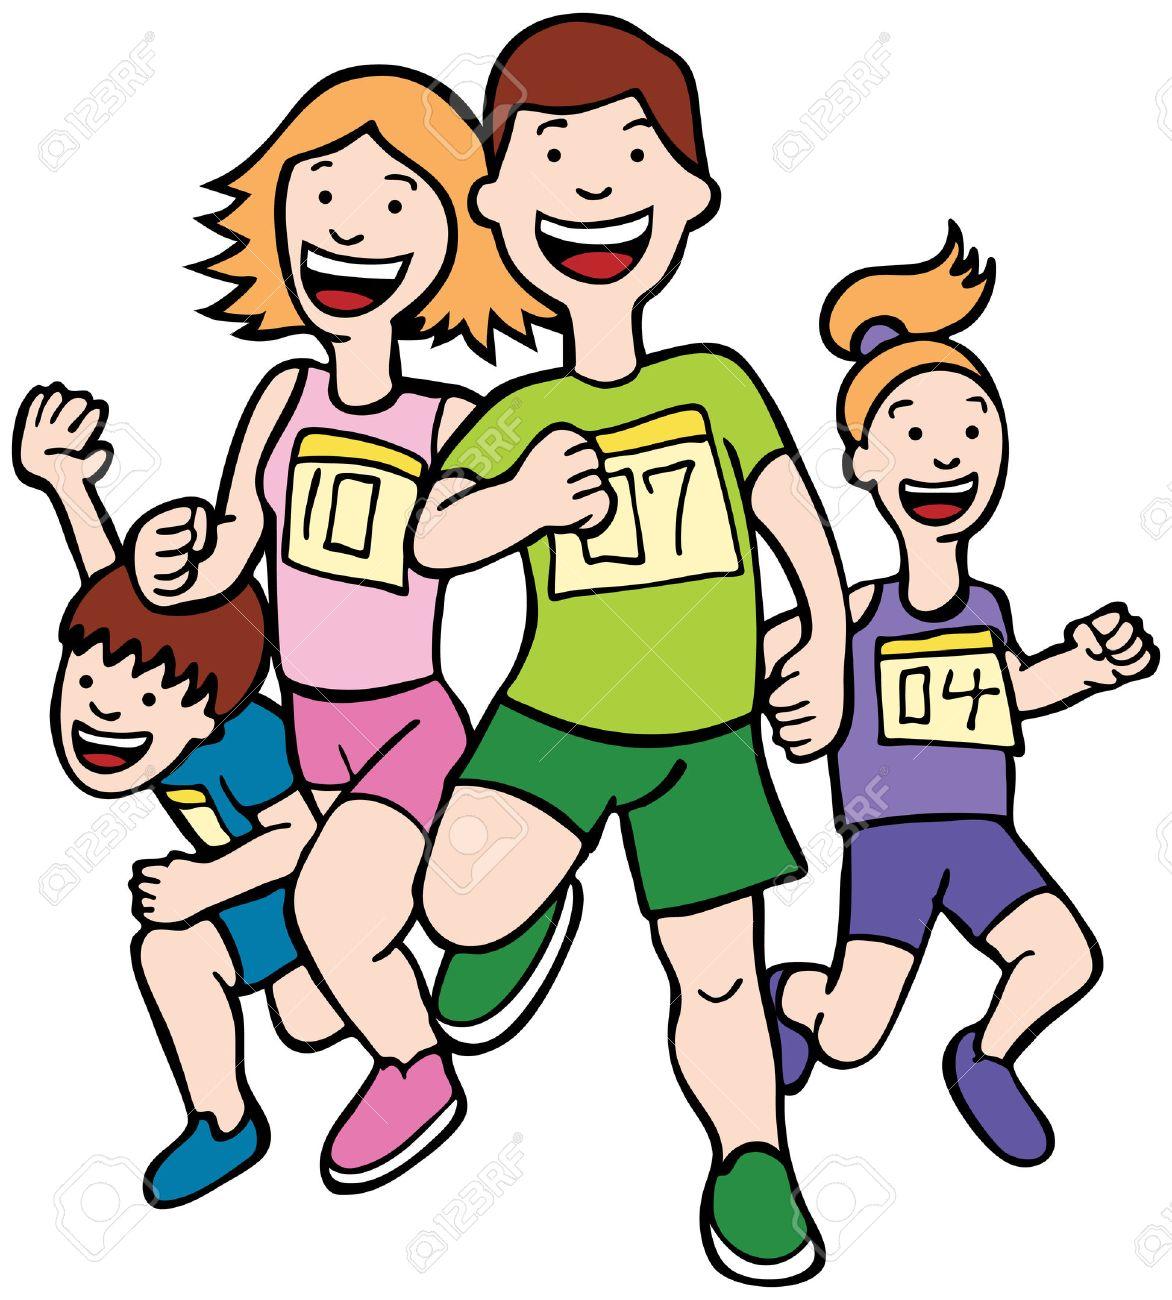 family run art cartoon of a family running together in a racing rh 123rf com Cartoon People Running Scared Two Cartoon People Running